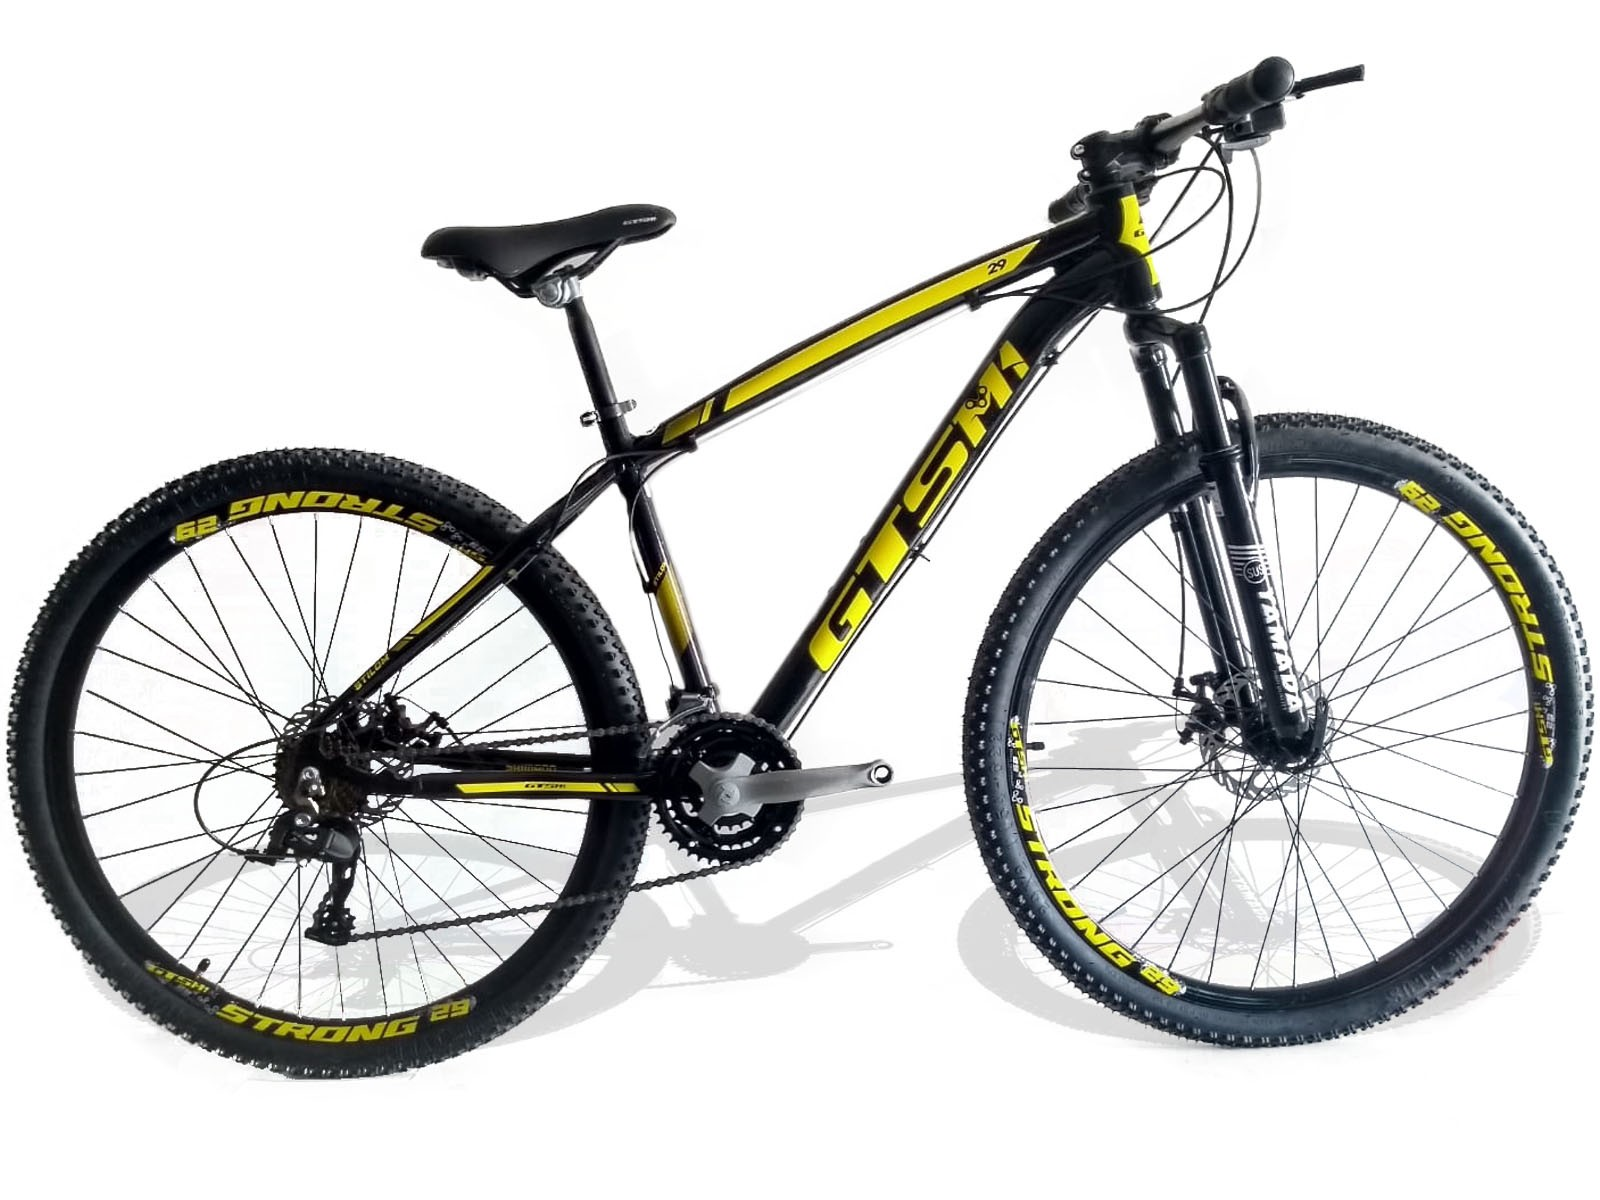 Bicicleta Gts M1 Stilom Amarela Aro 29   - REAL ESPORTE